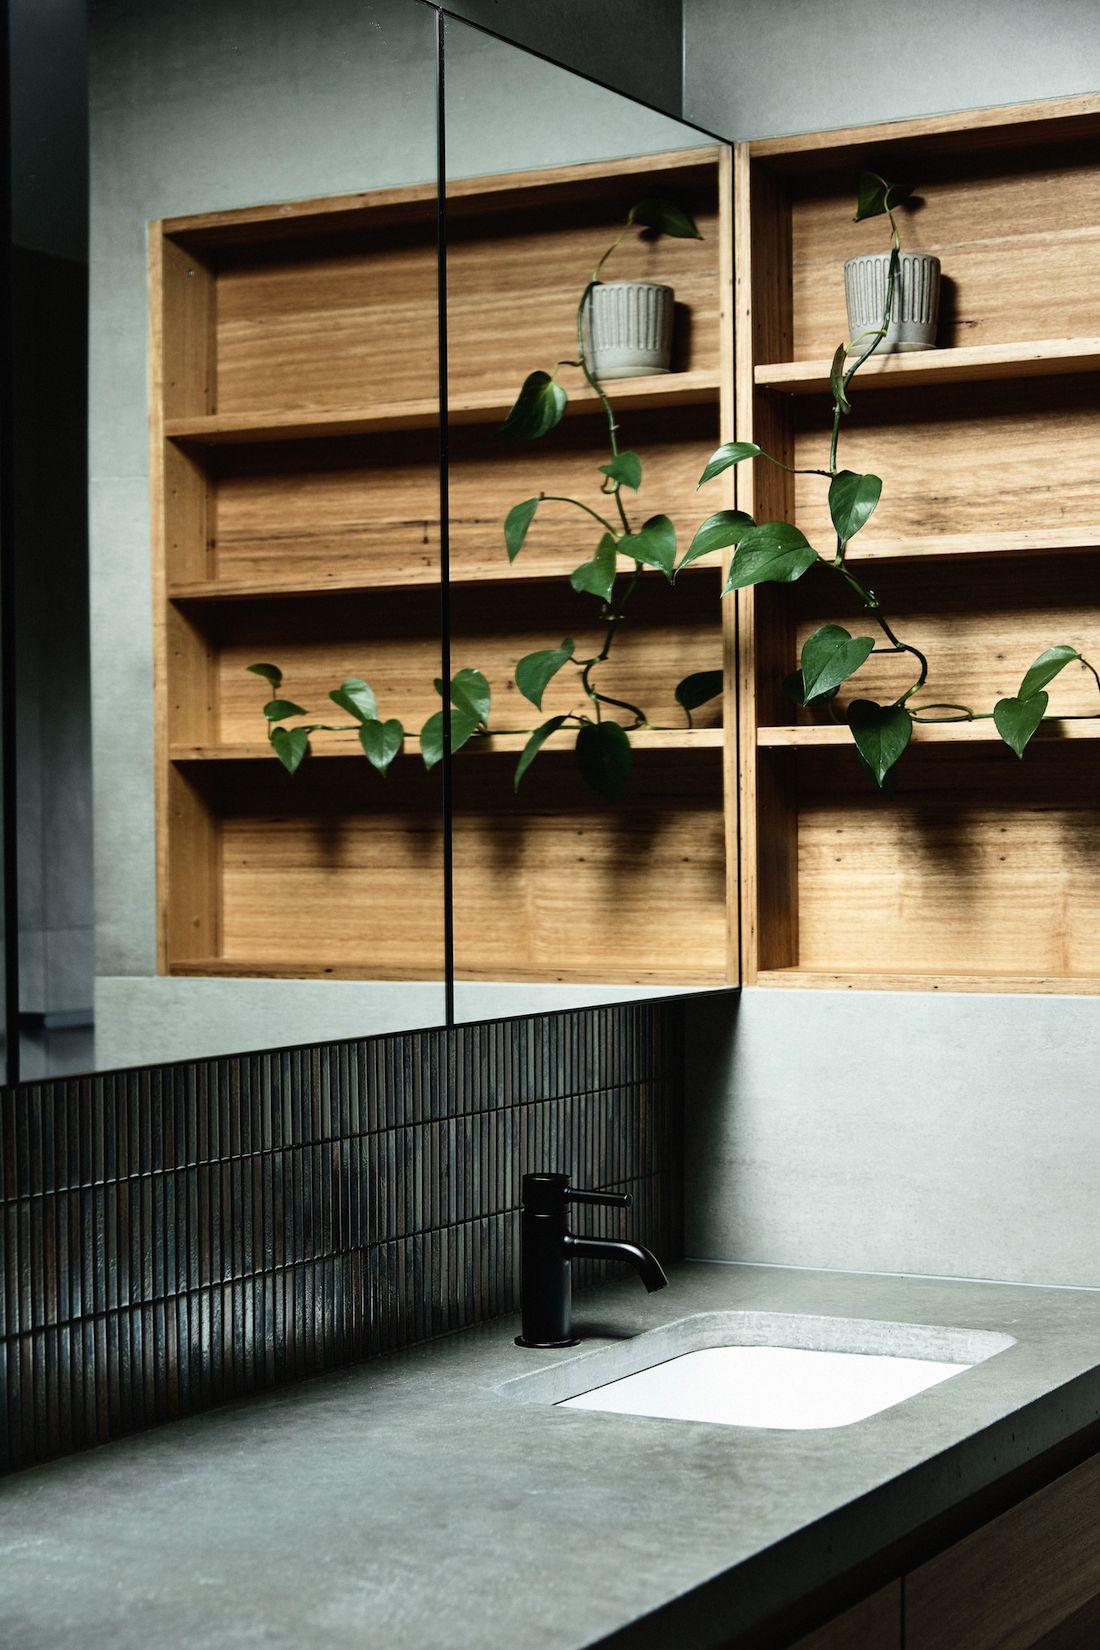 Dark tiled bathroom with timber shelving